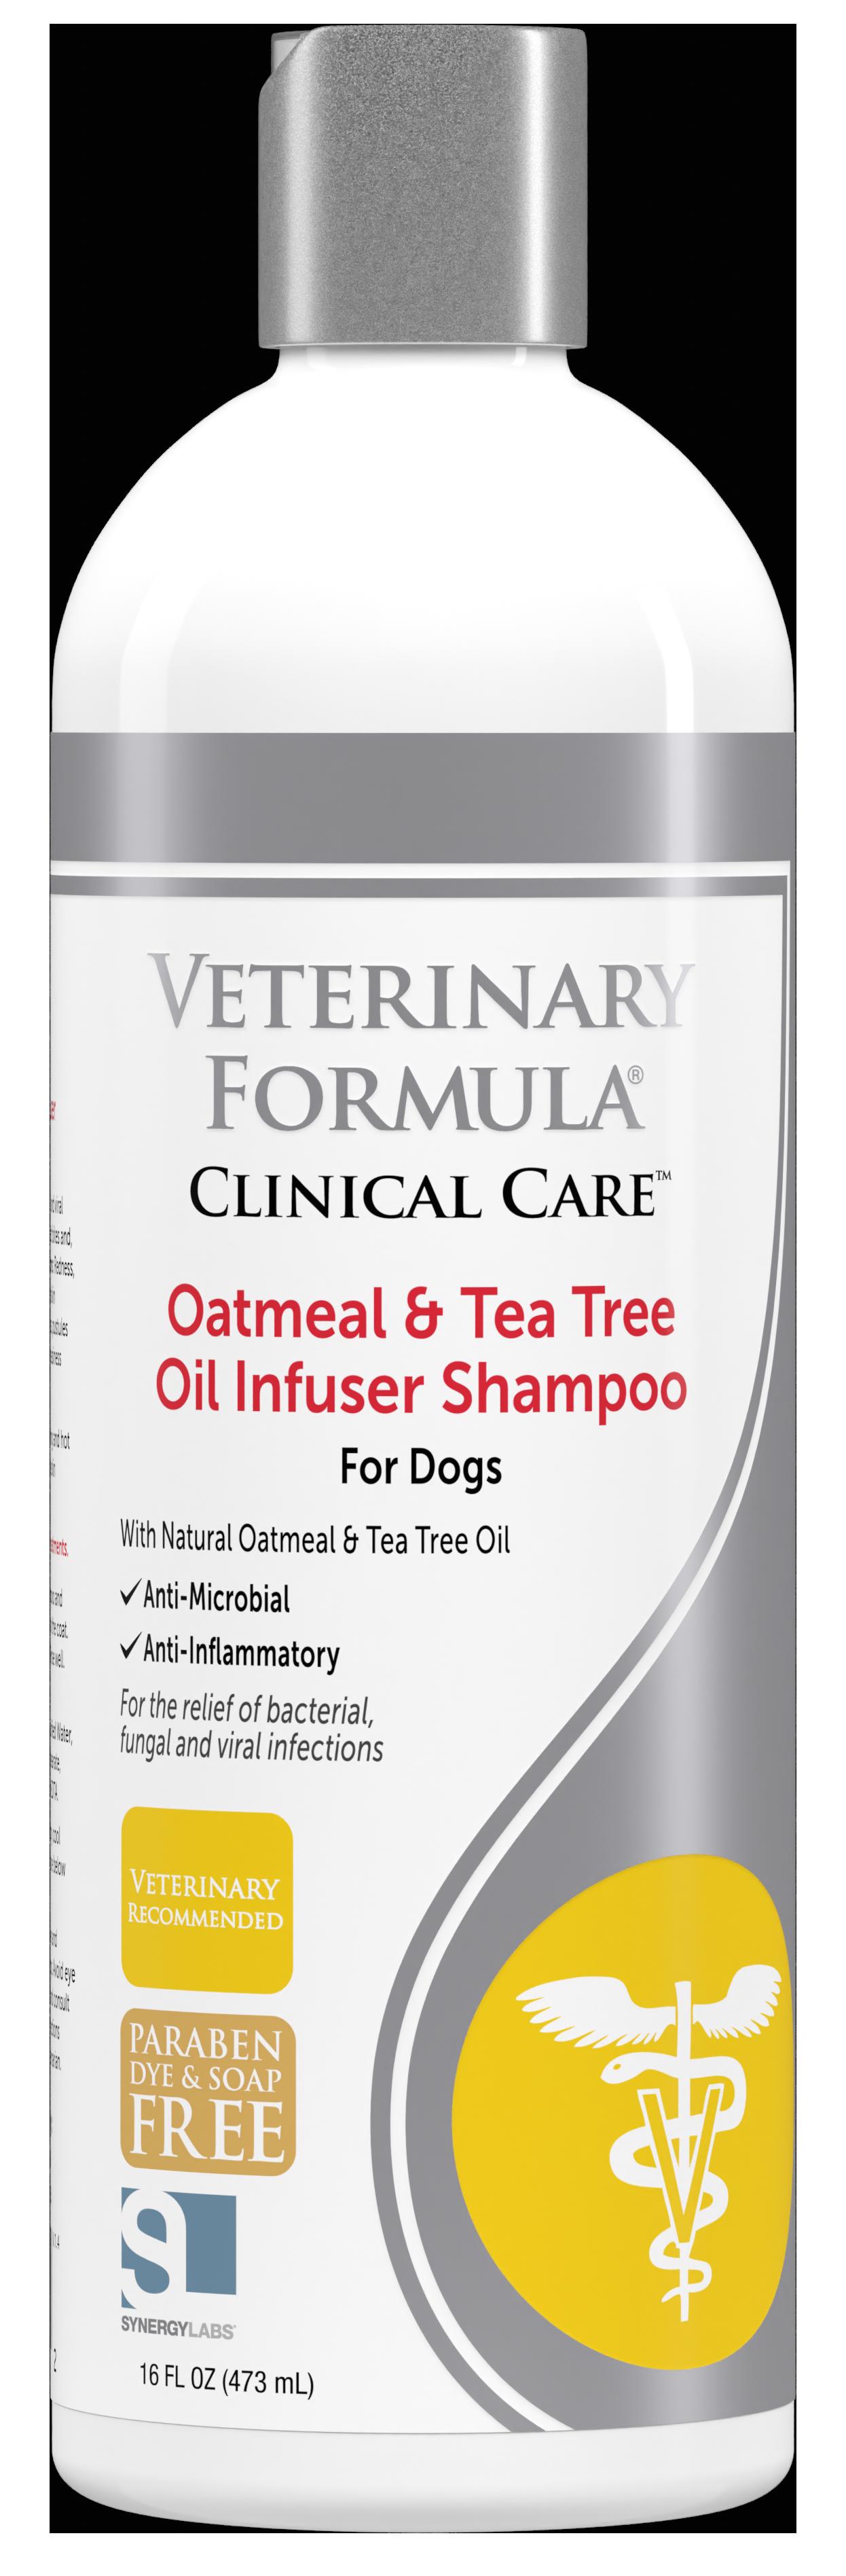 Oatmeal & Tea Tree Oil Infuser Shampoo